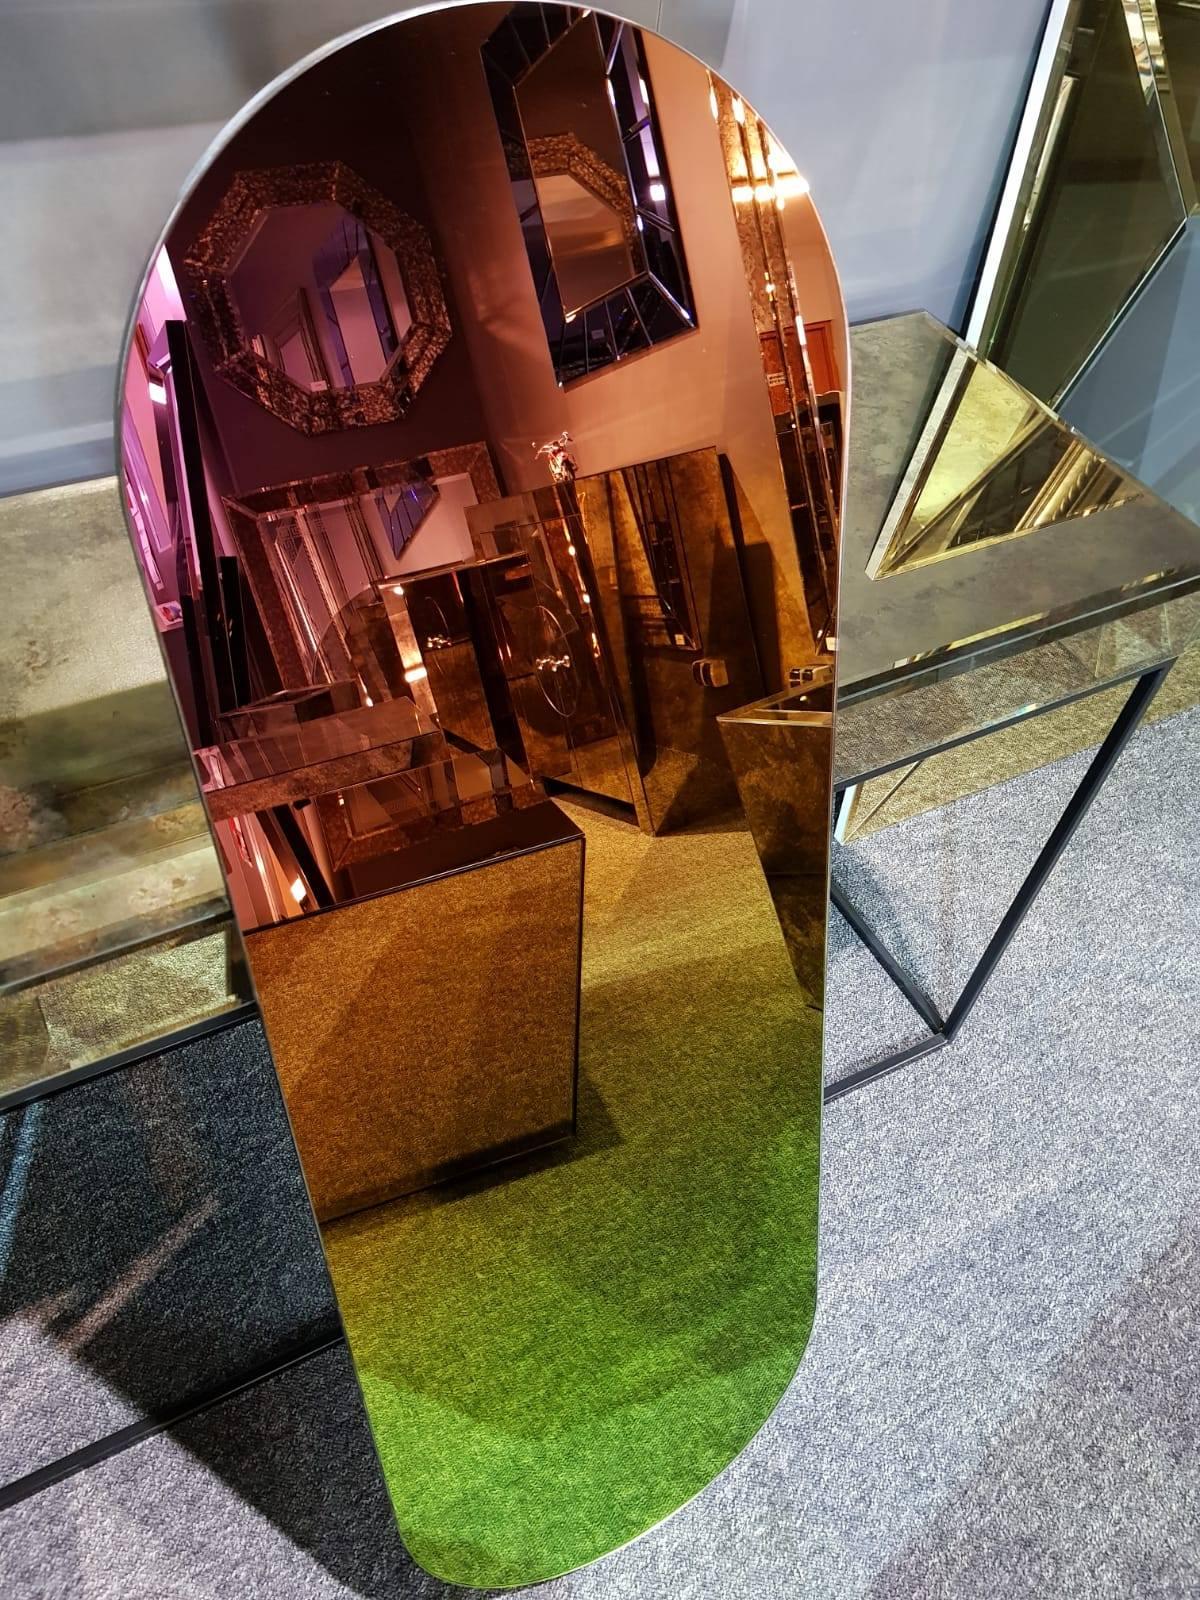 regenboog spiegel